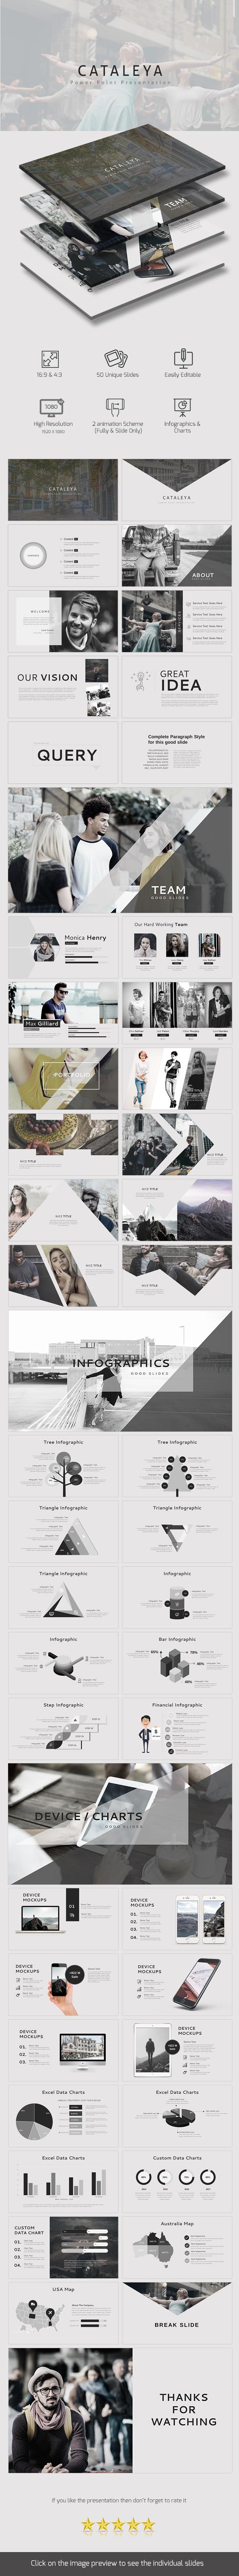 Cataleya PowerPoint Presentation - Business PowerPoint Templates